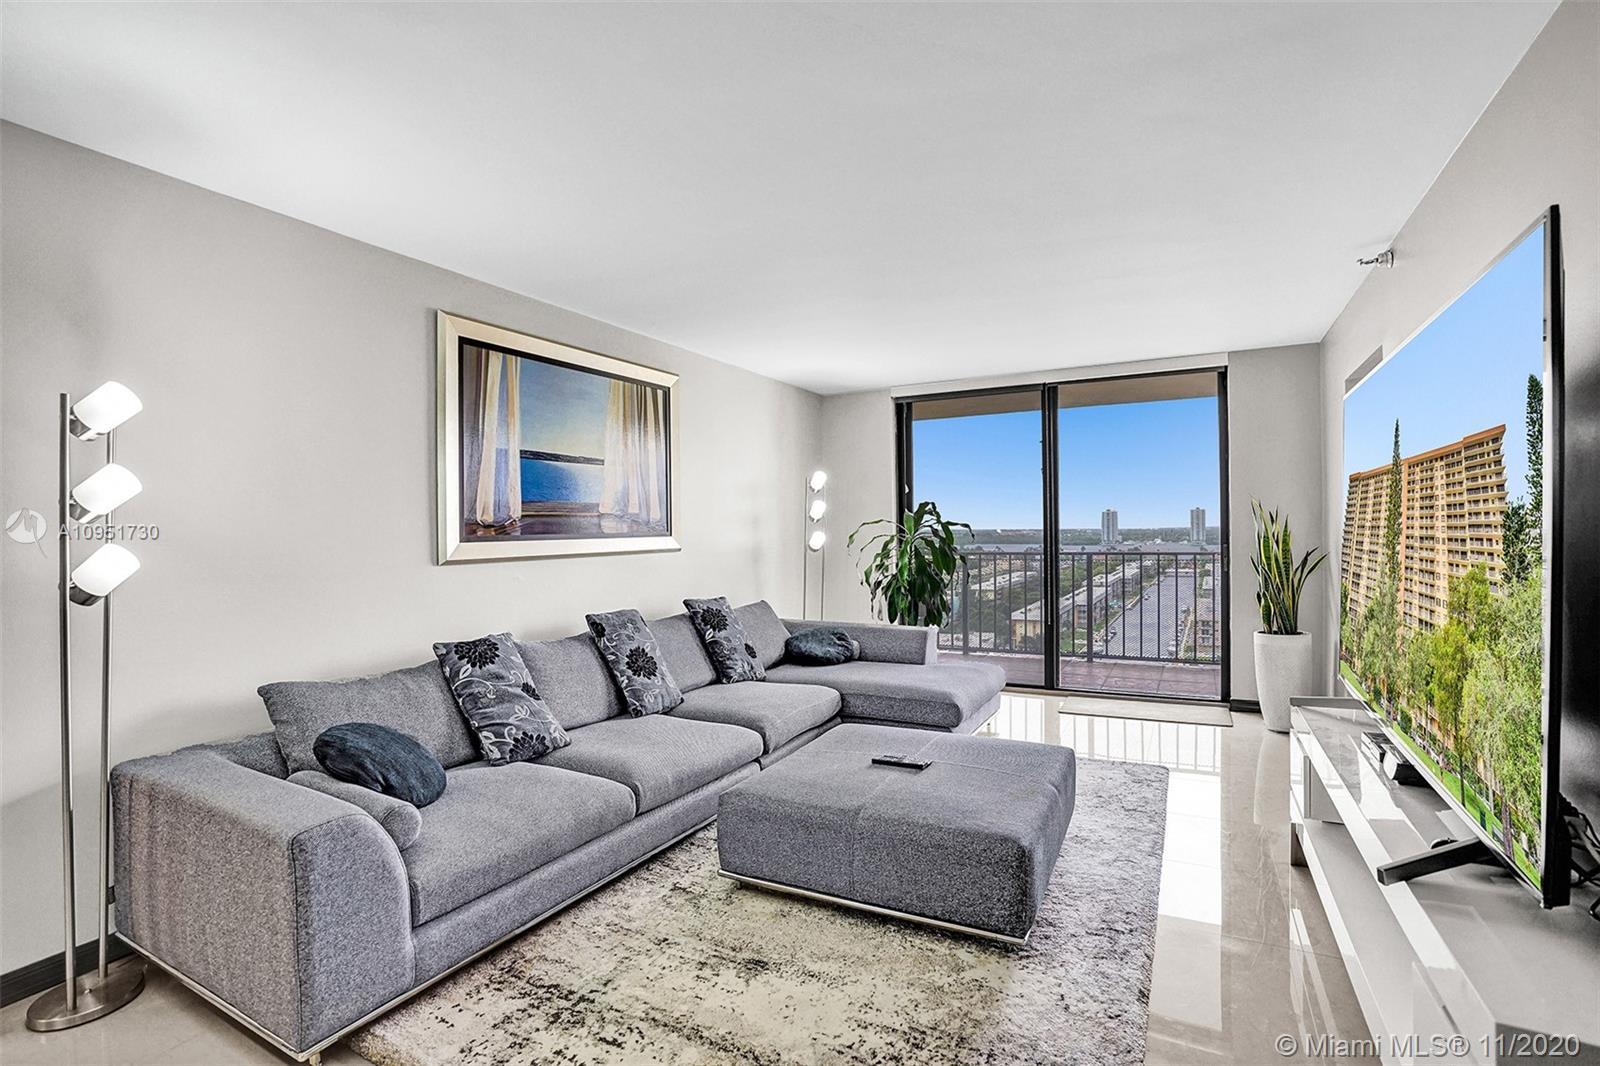 Fully renovated  2 Bedroom / 2 Bathroom unit with beautiful Intracoastal & City views. Spacious clos